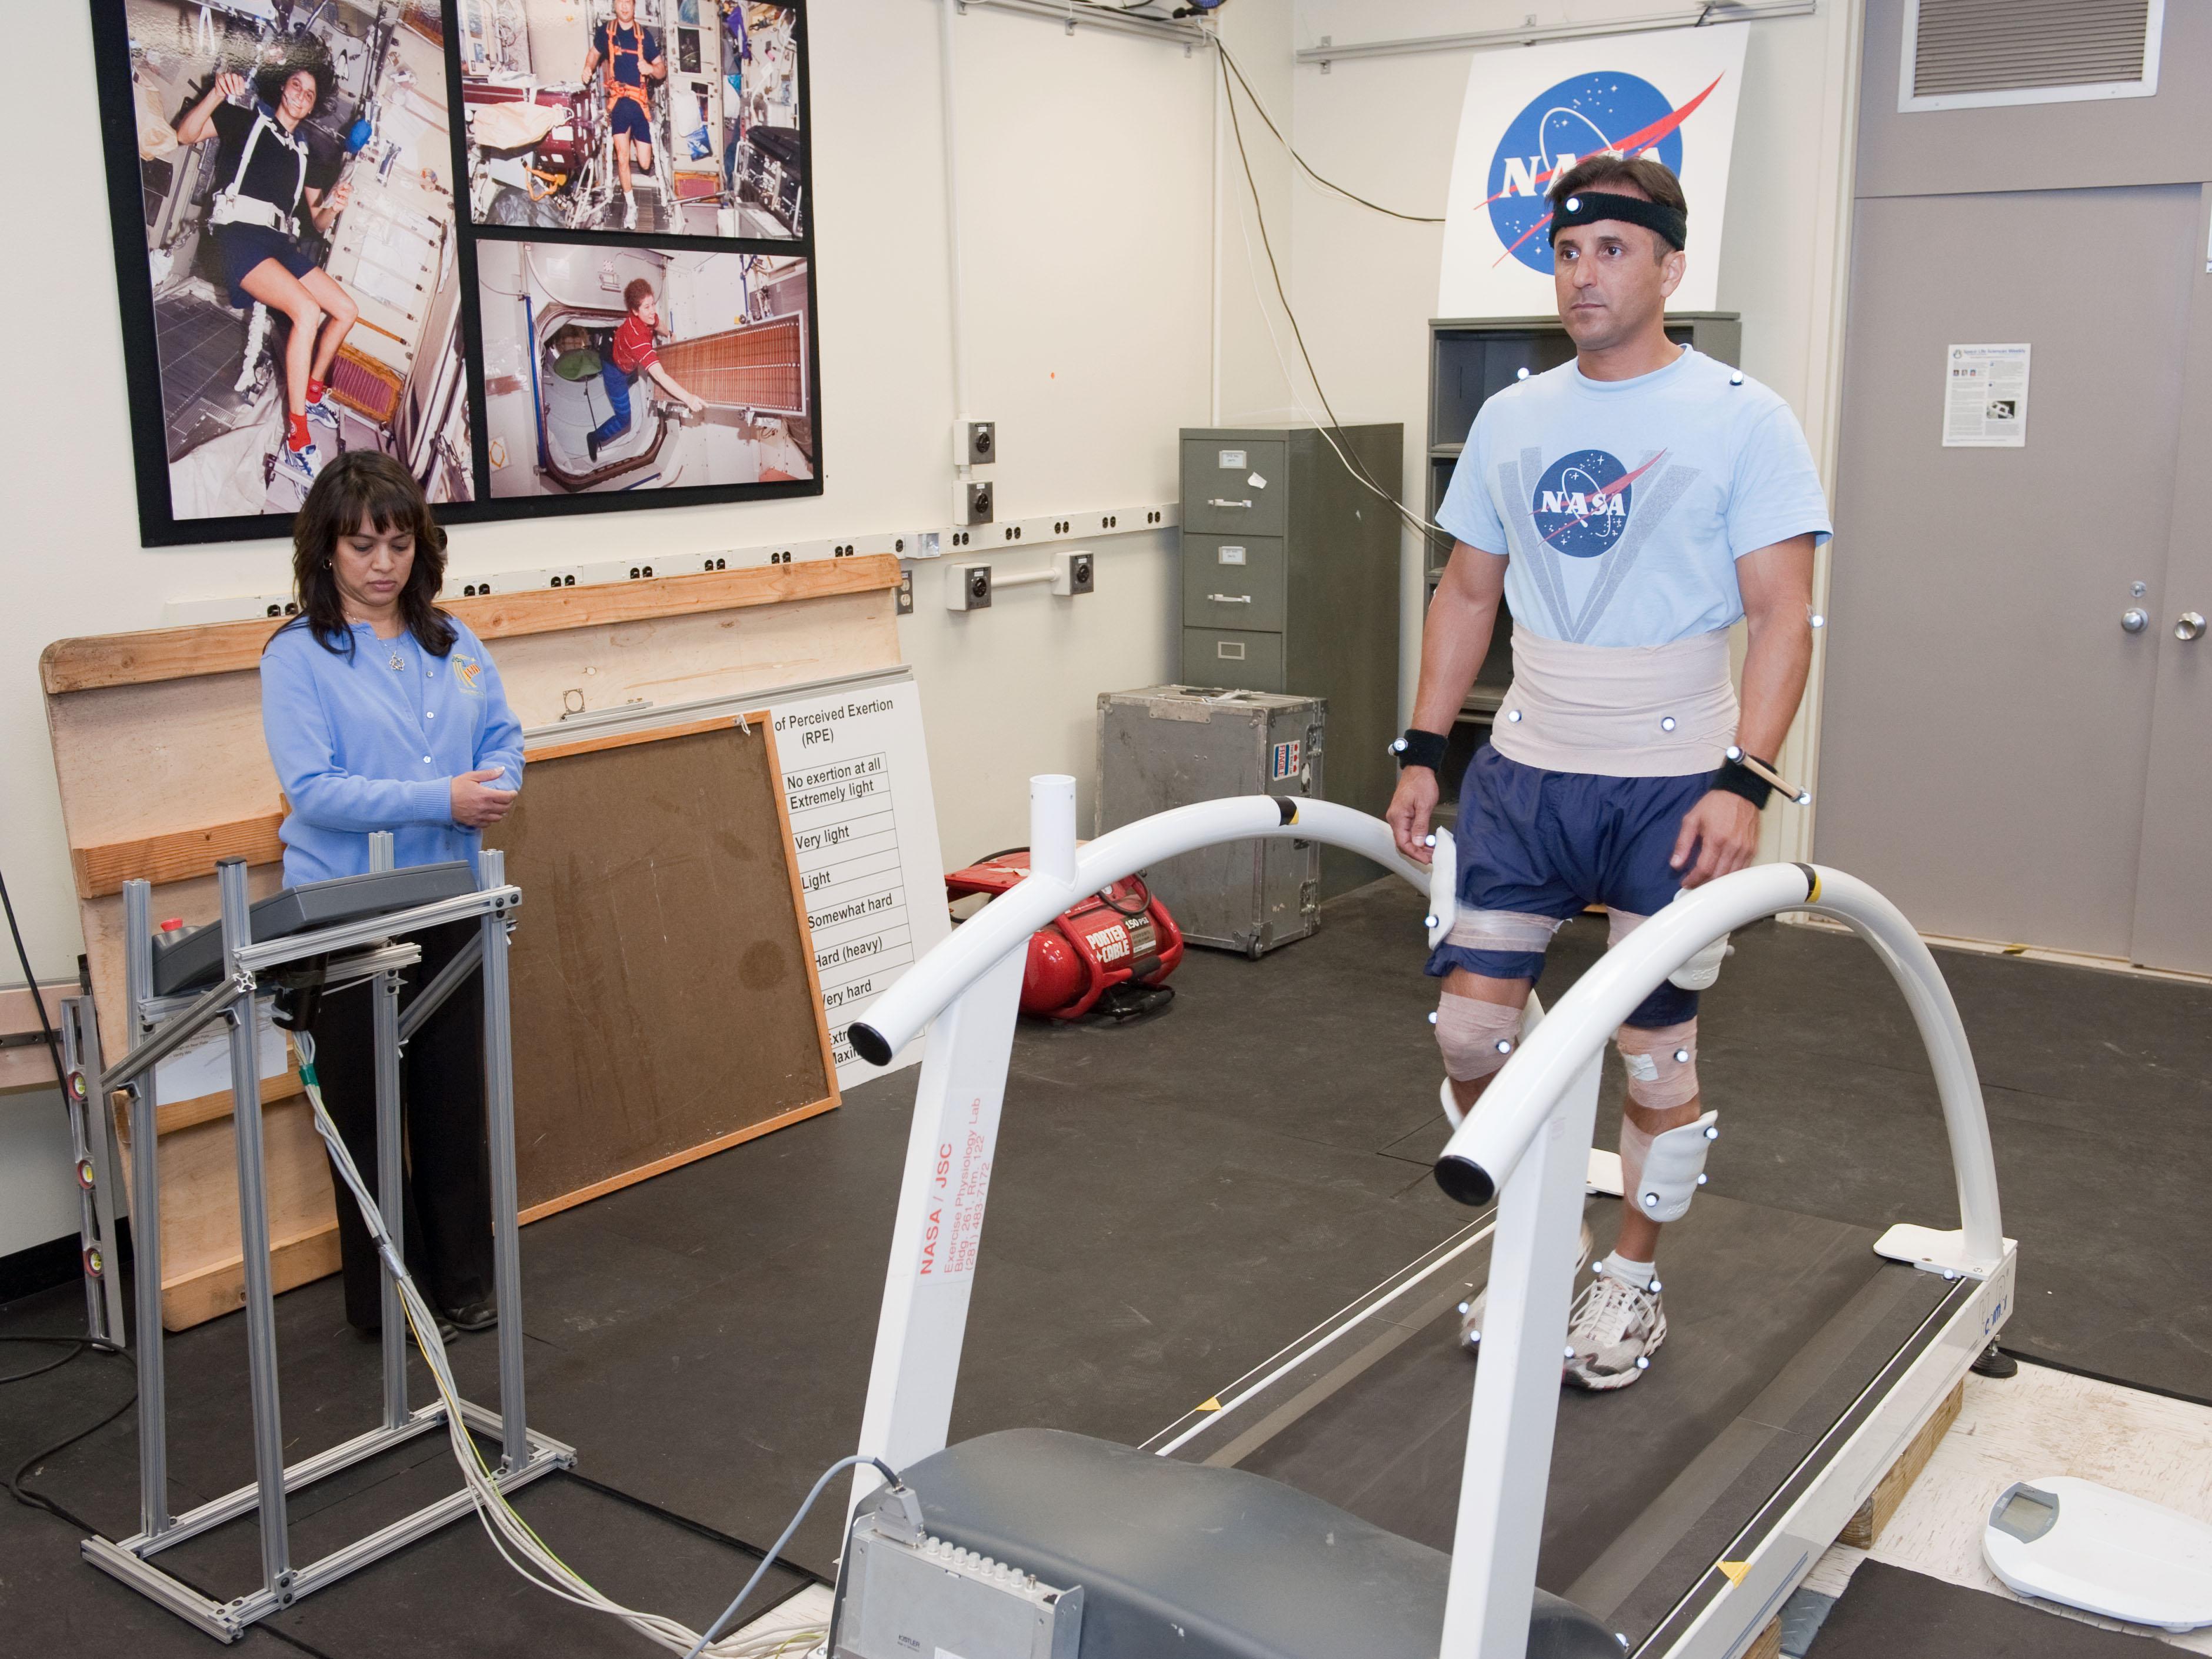 Astronaut Joe Acaba in Training